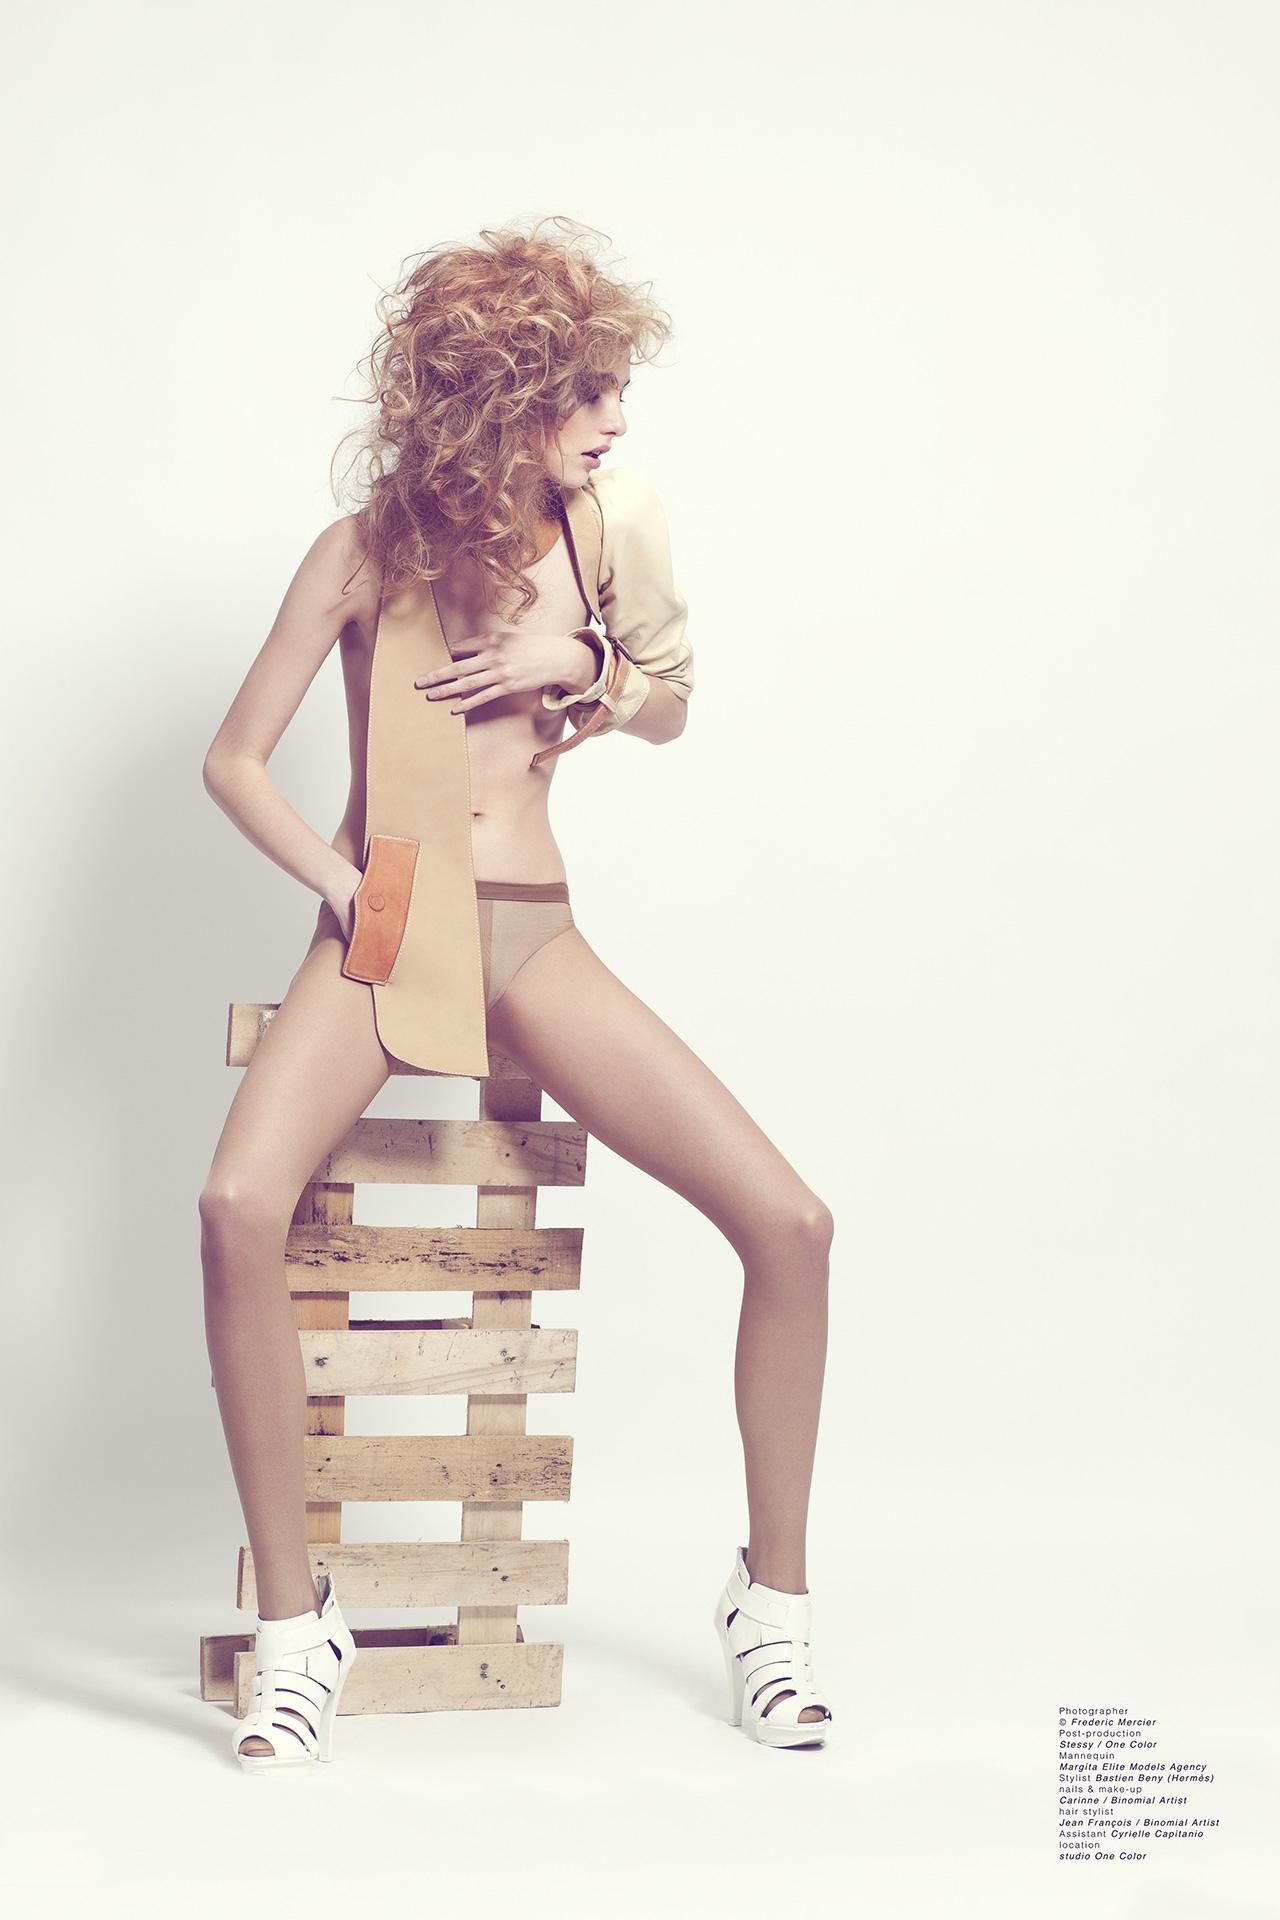 hermes frederic mercier photographer edito fashion bastien beny elite models one color